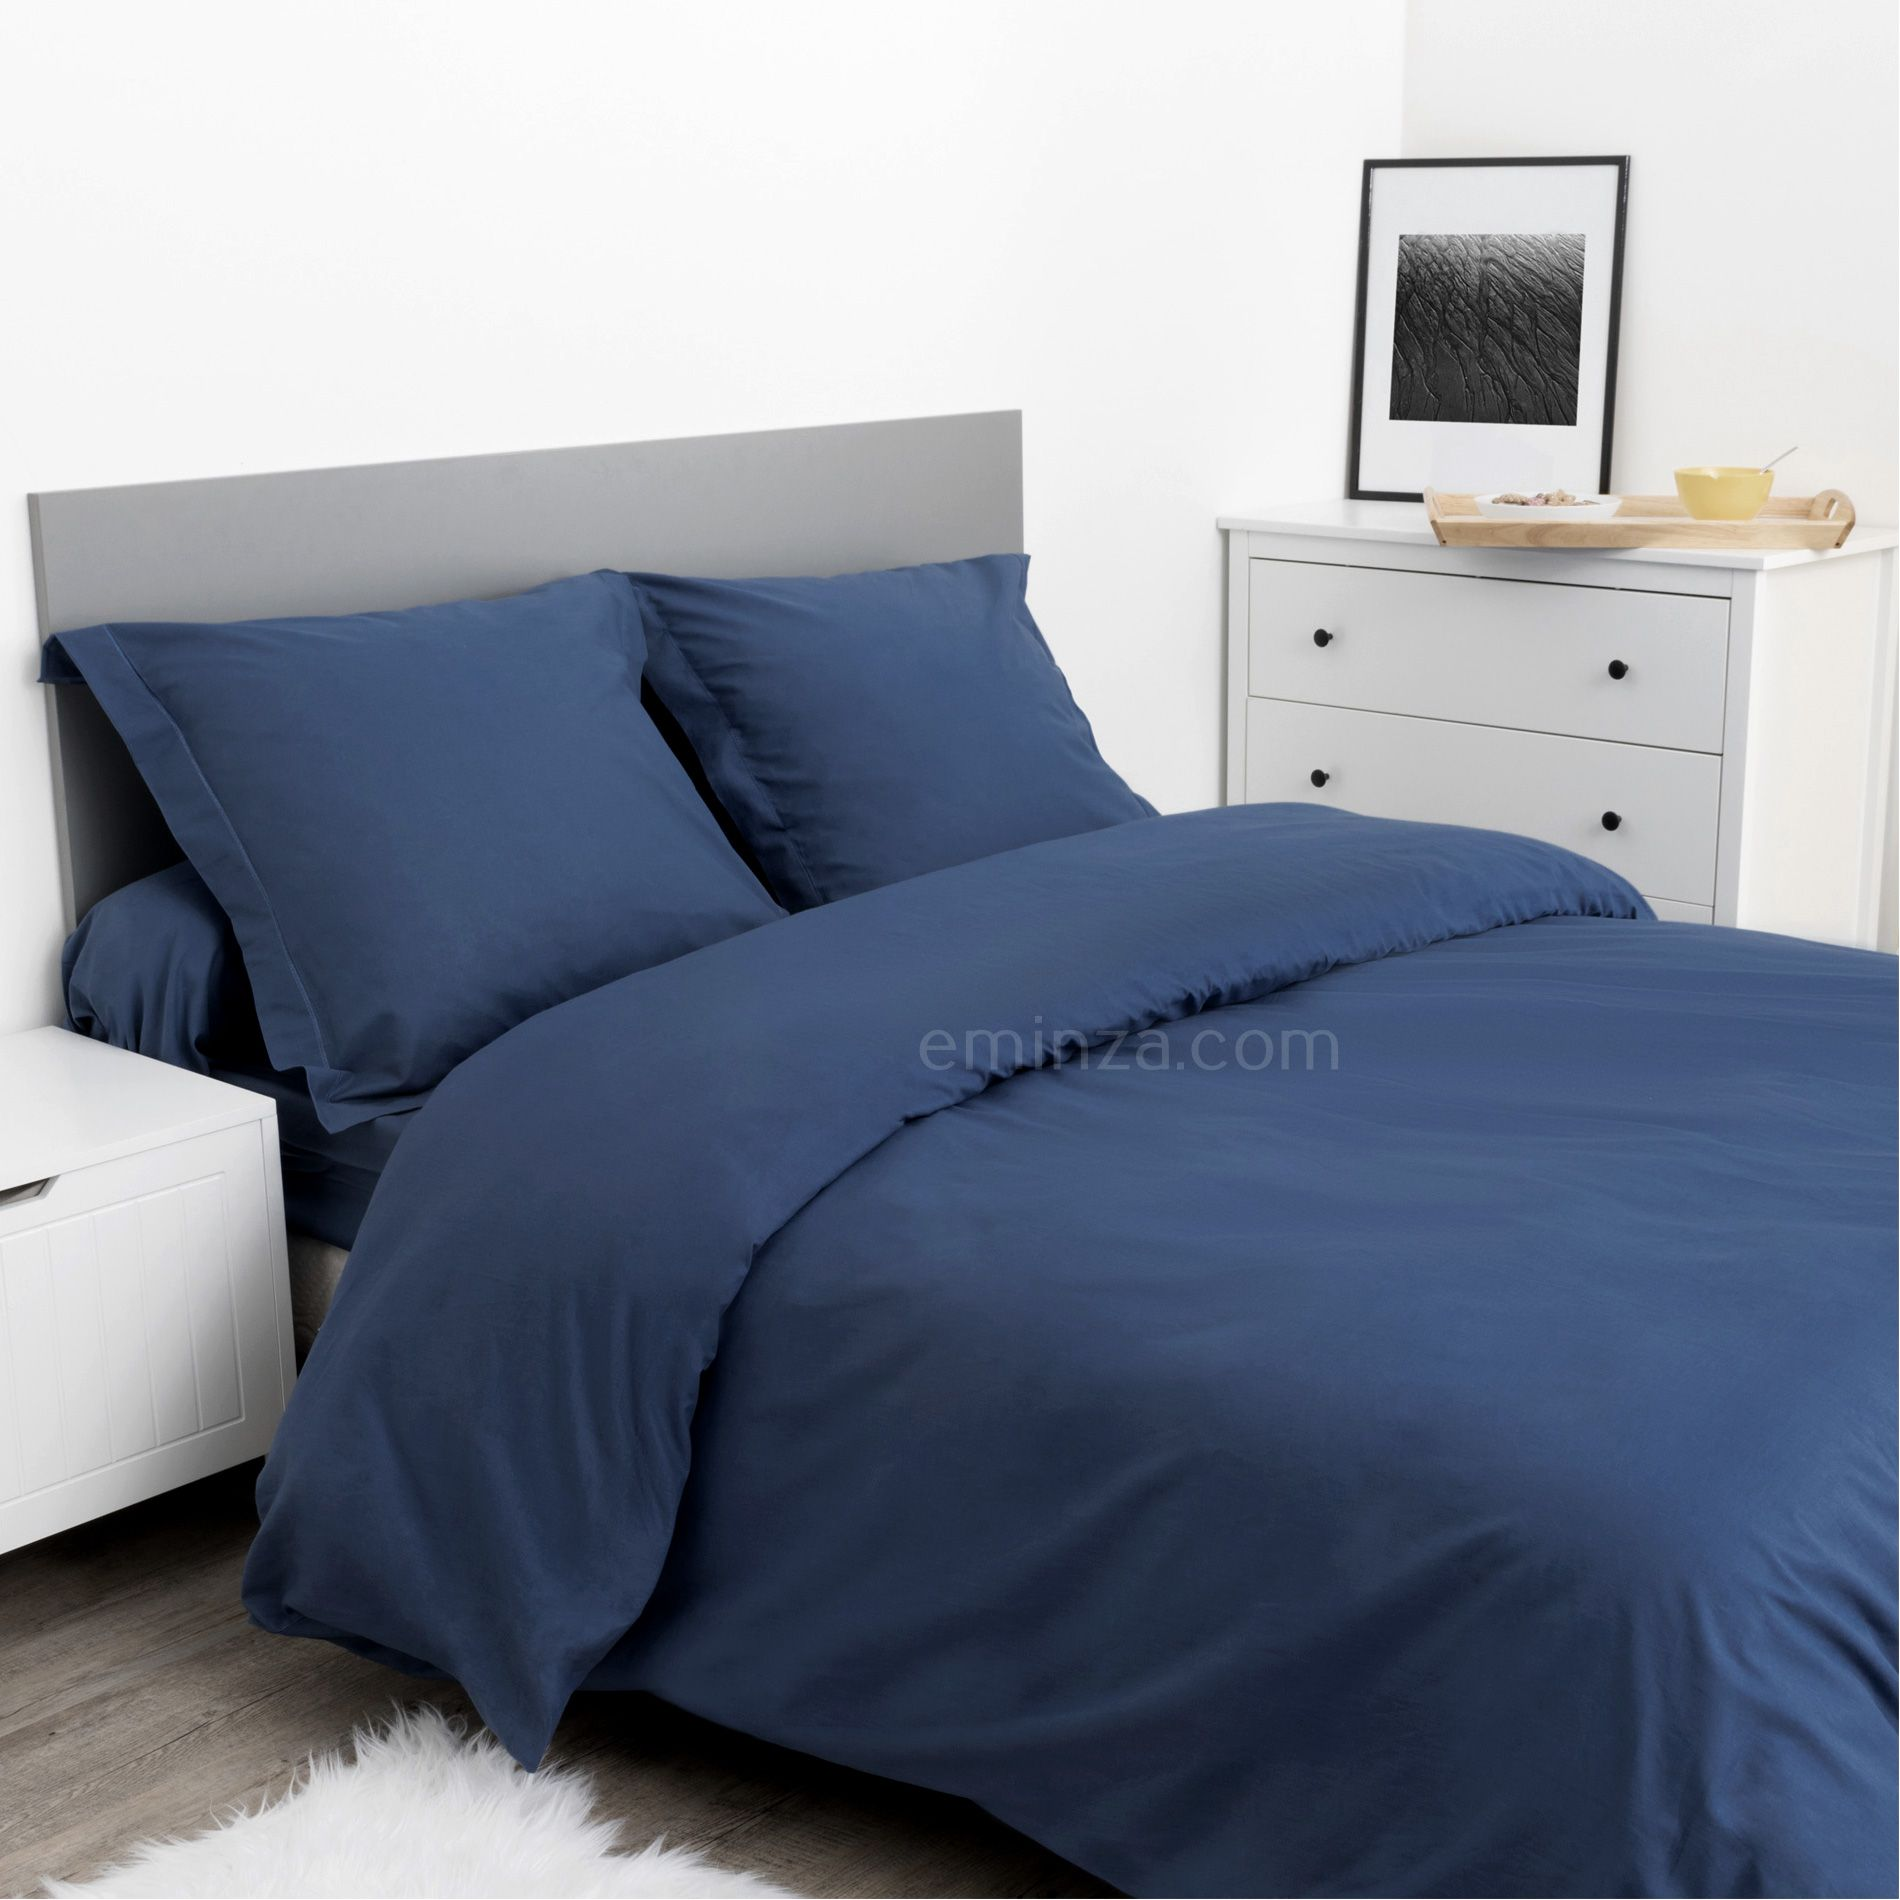 taie de traversin confort bleu taie d 39 oreiller traversin eminza. Black Bedroom Furniture Sets. Home Design Ideas